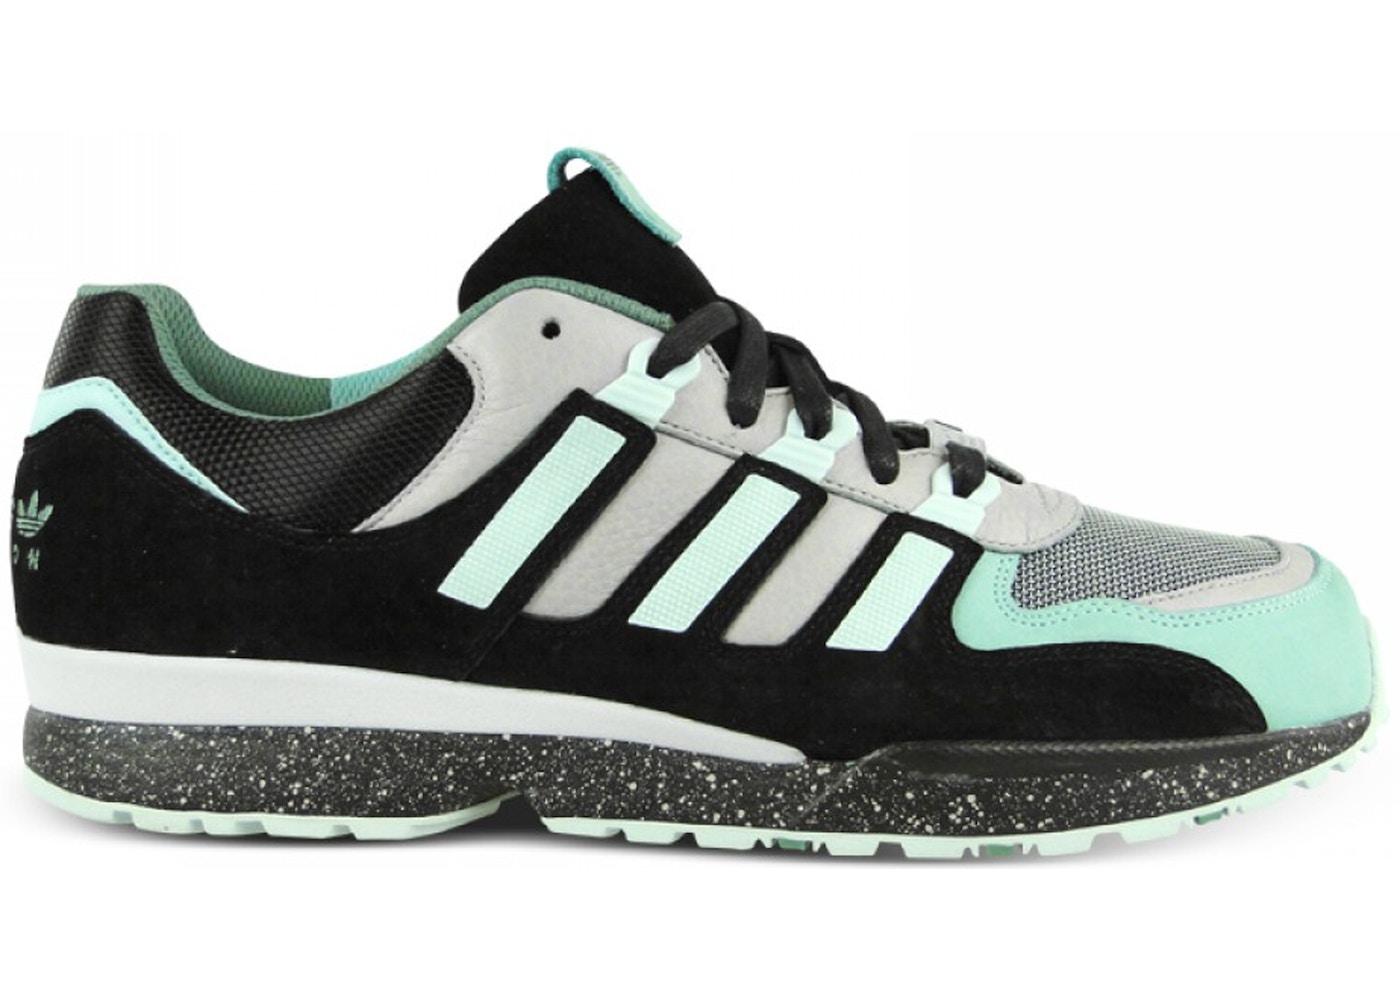 Freaker M22415 Sneaker S Black Adidas Torsion Integral wCOHHq